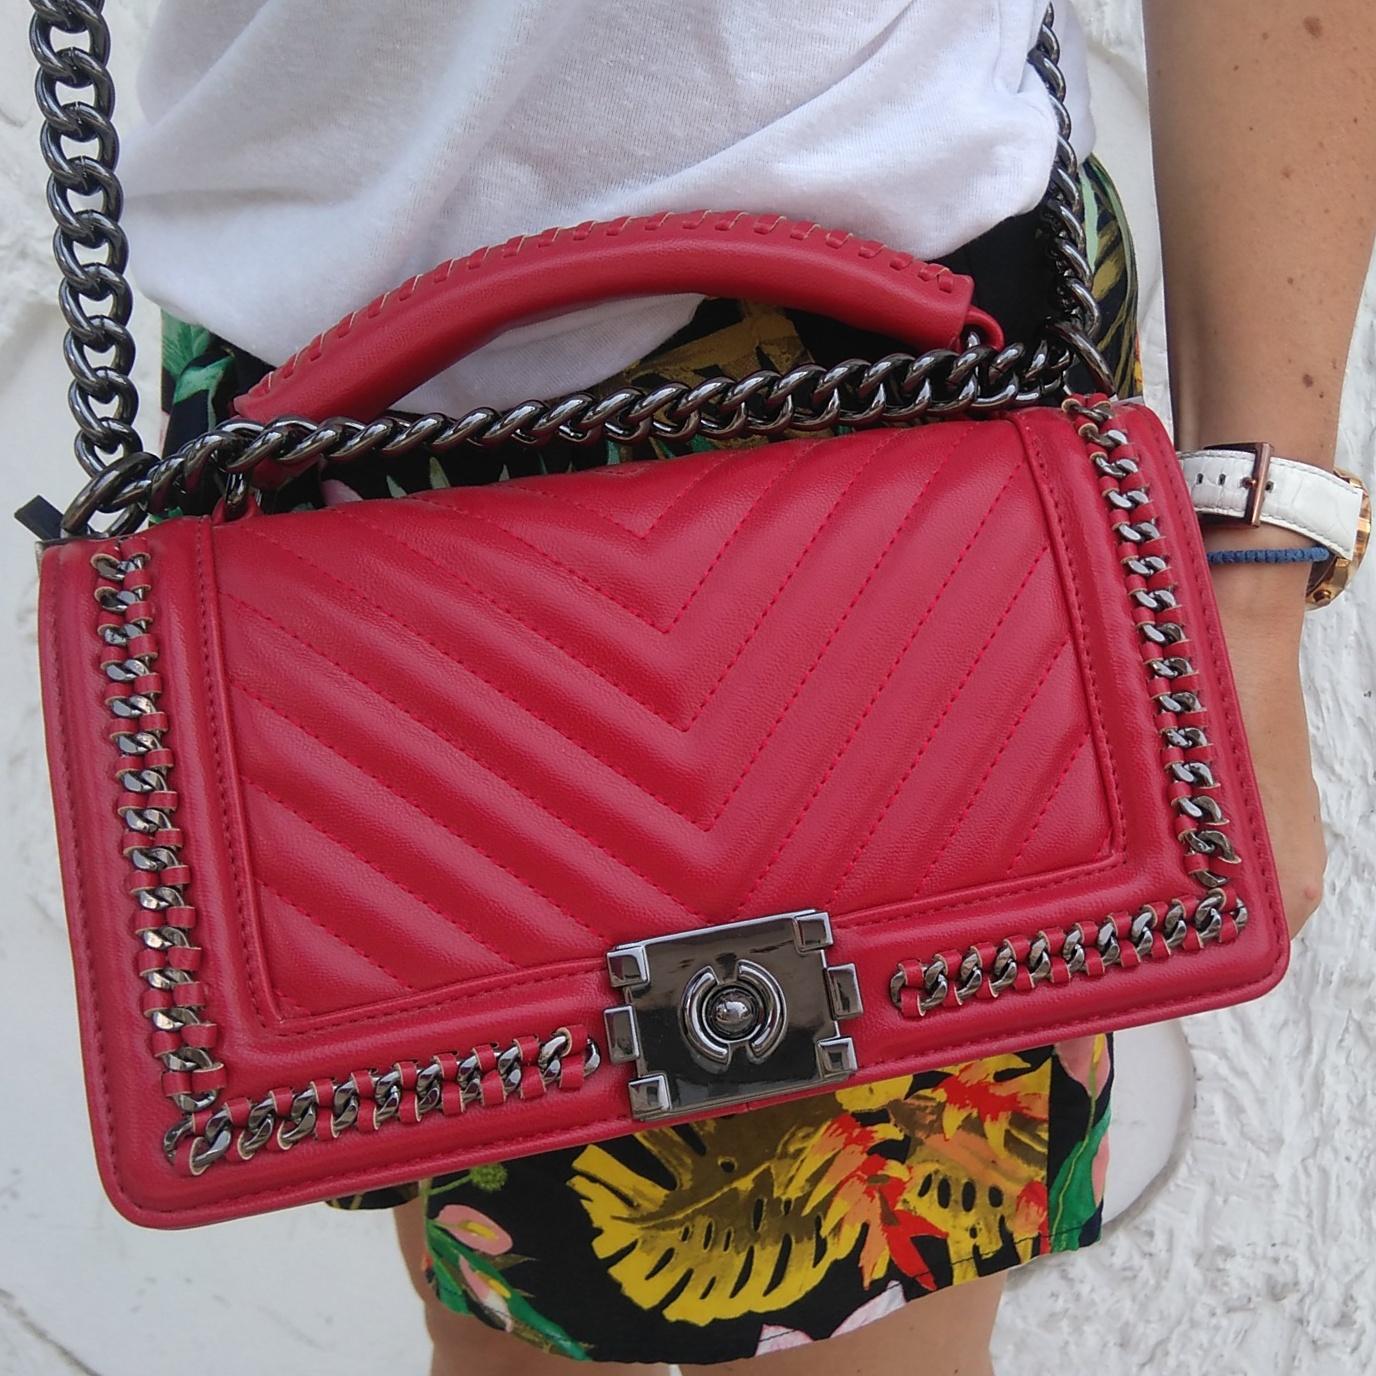 b86964e023 Κόκκινη τσάντα τύπου Chanel Boy bag